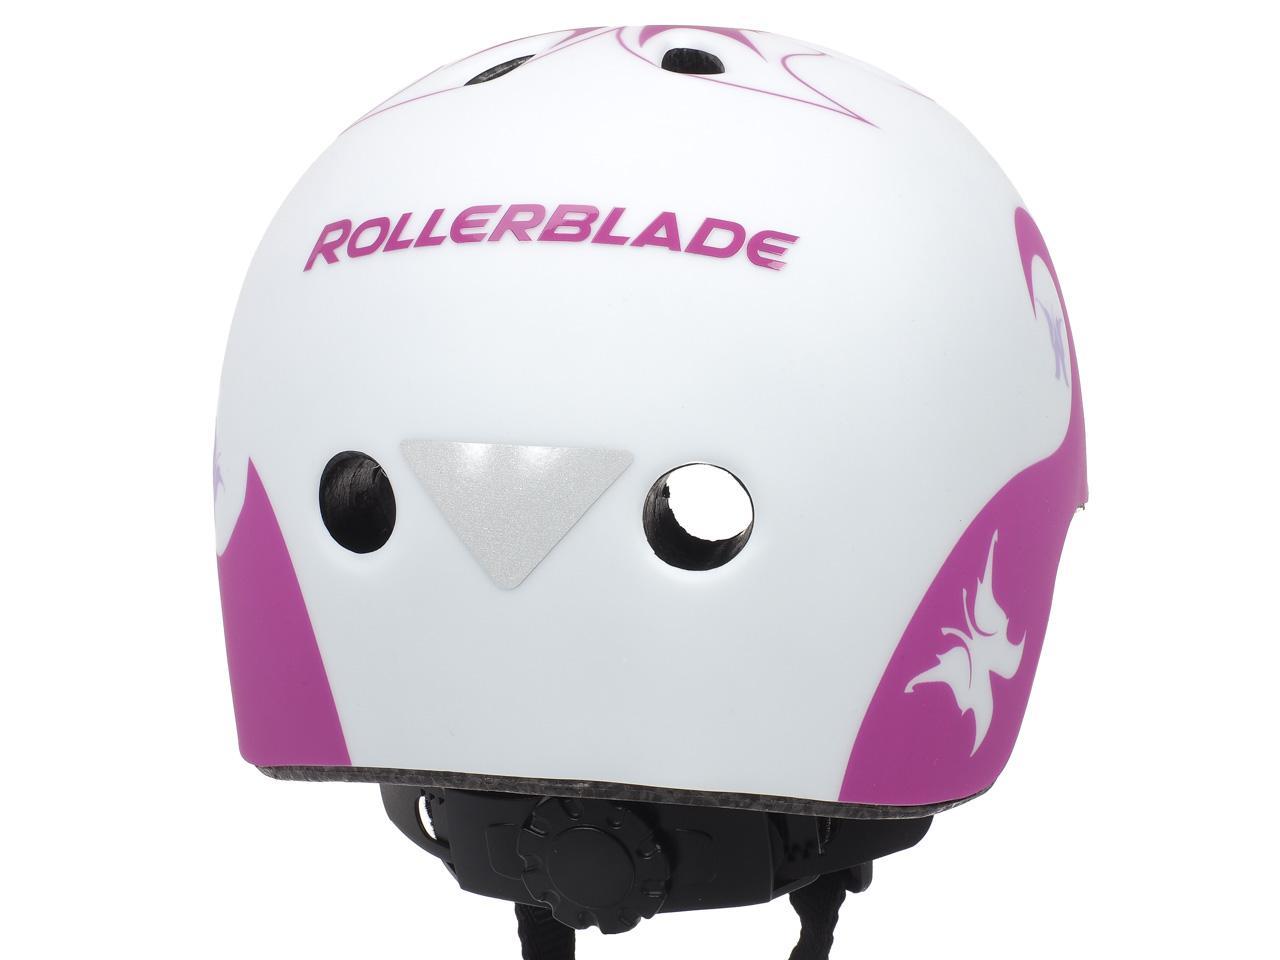 Casque-roller-skate-trotinette-Rollerblade-Twist-jr-blc-casque-Rose-15103-Neuf miniature 2